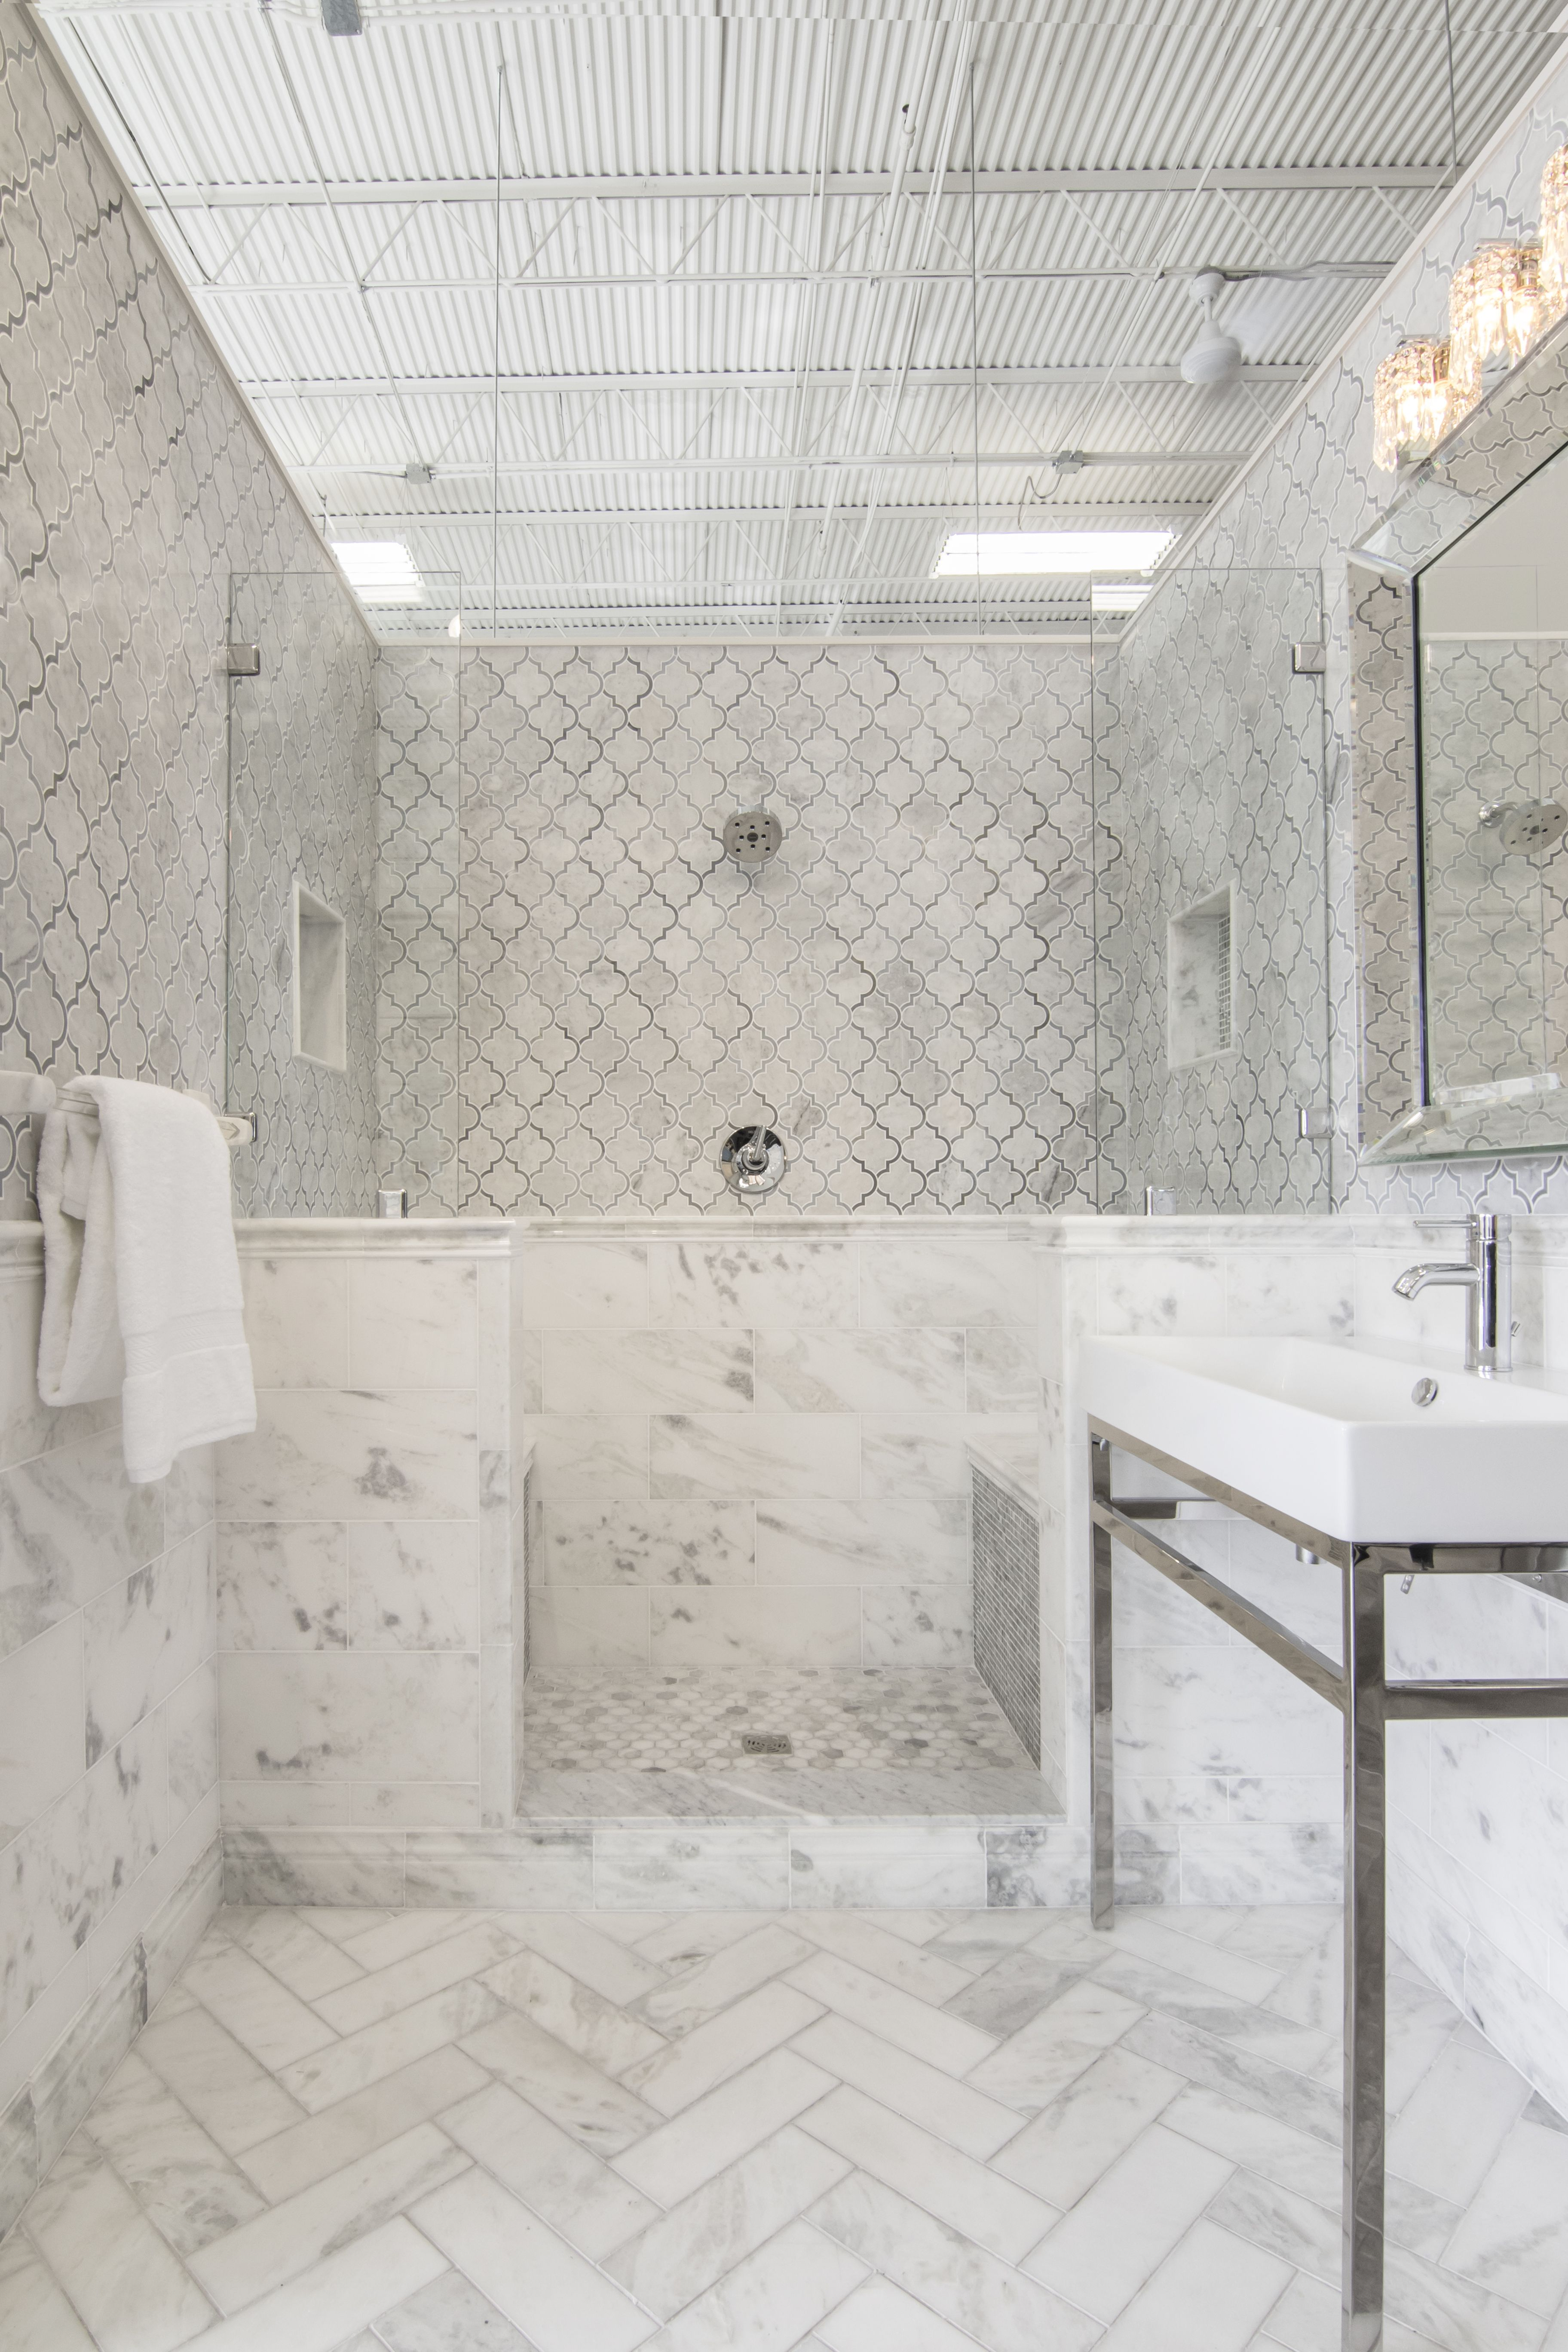 Bathroom floor tile - Tempesta Neve Polished Marble subway ...